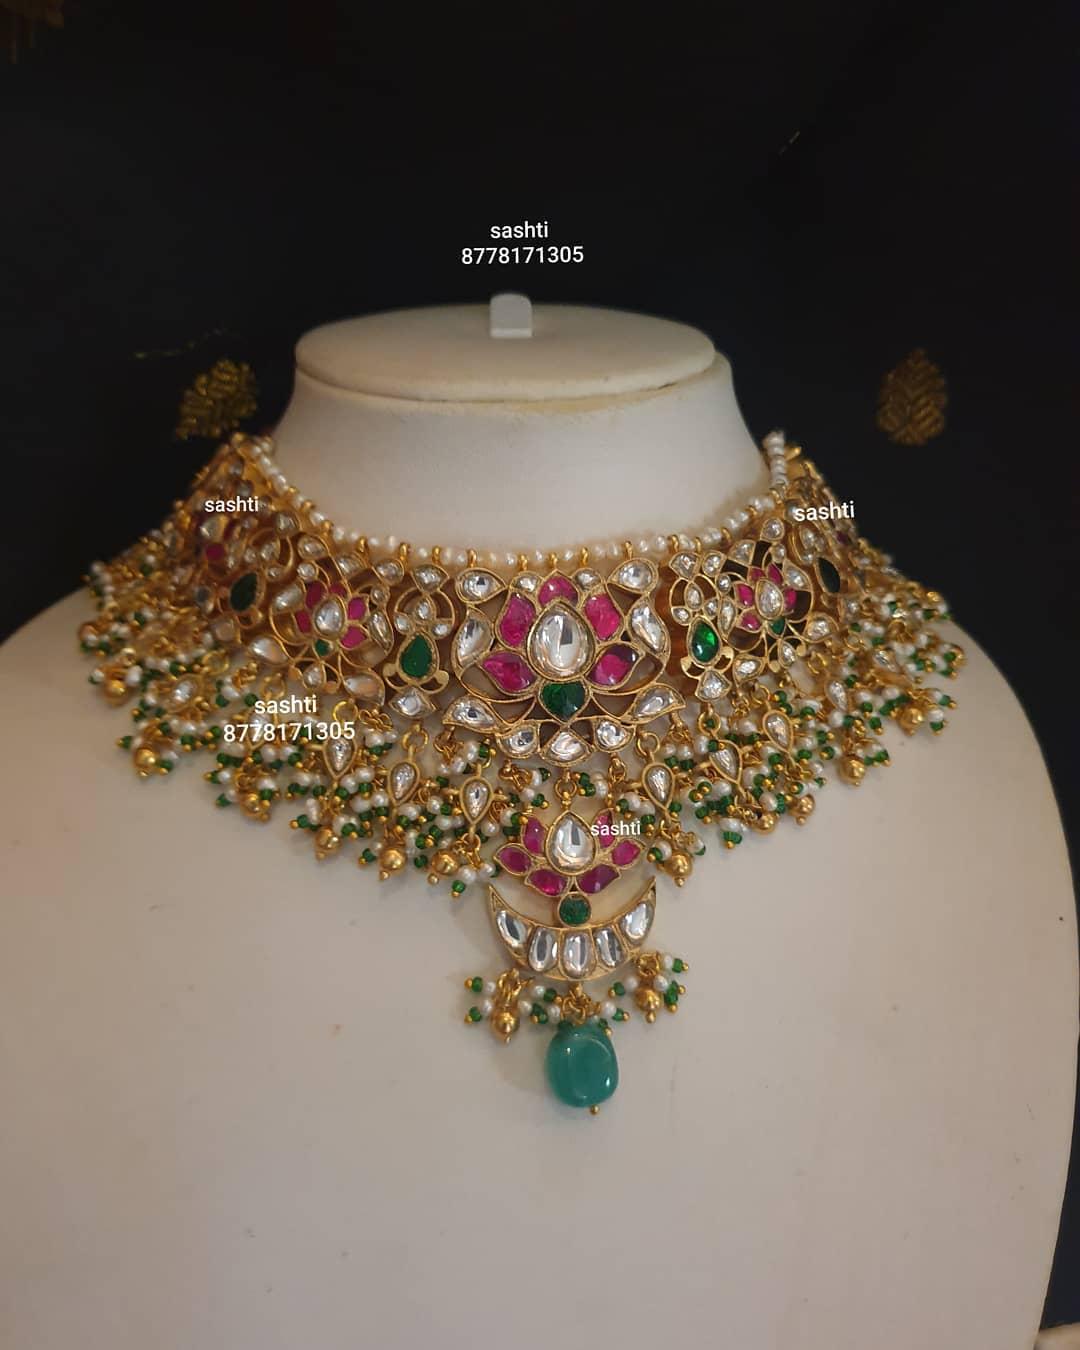 kundan-guttapusalu-choker-necklace